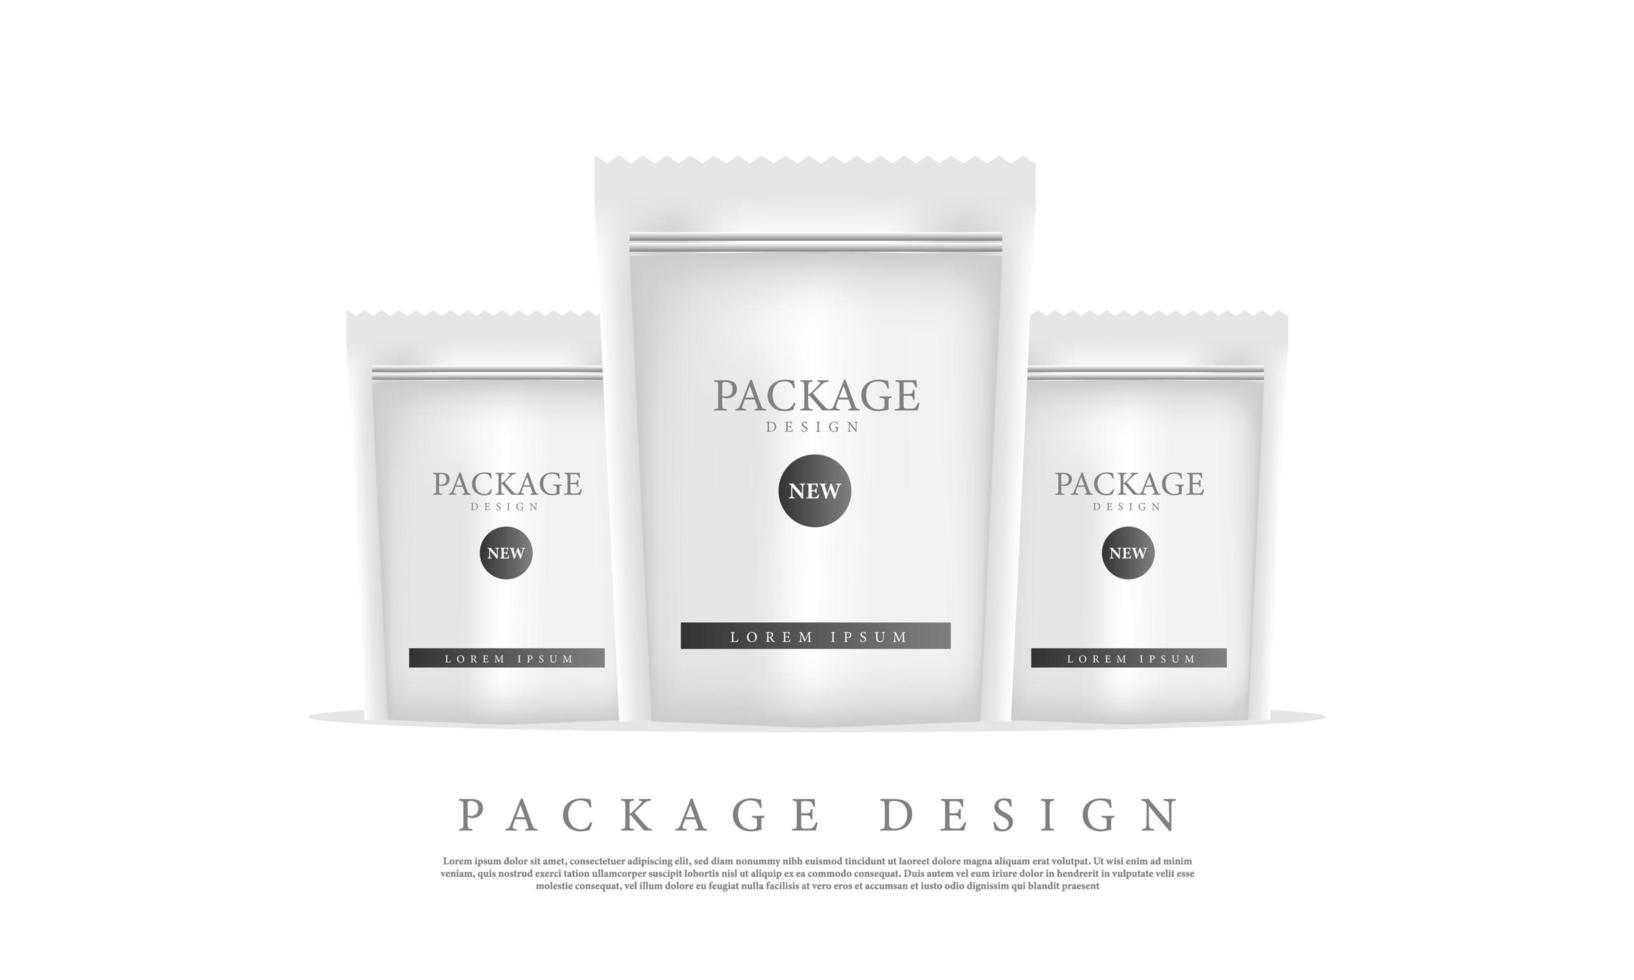 modelos de pacote de saco de marca de maquete vetor